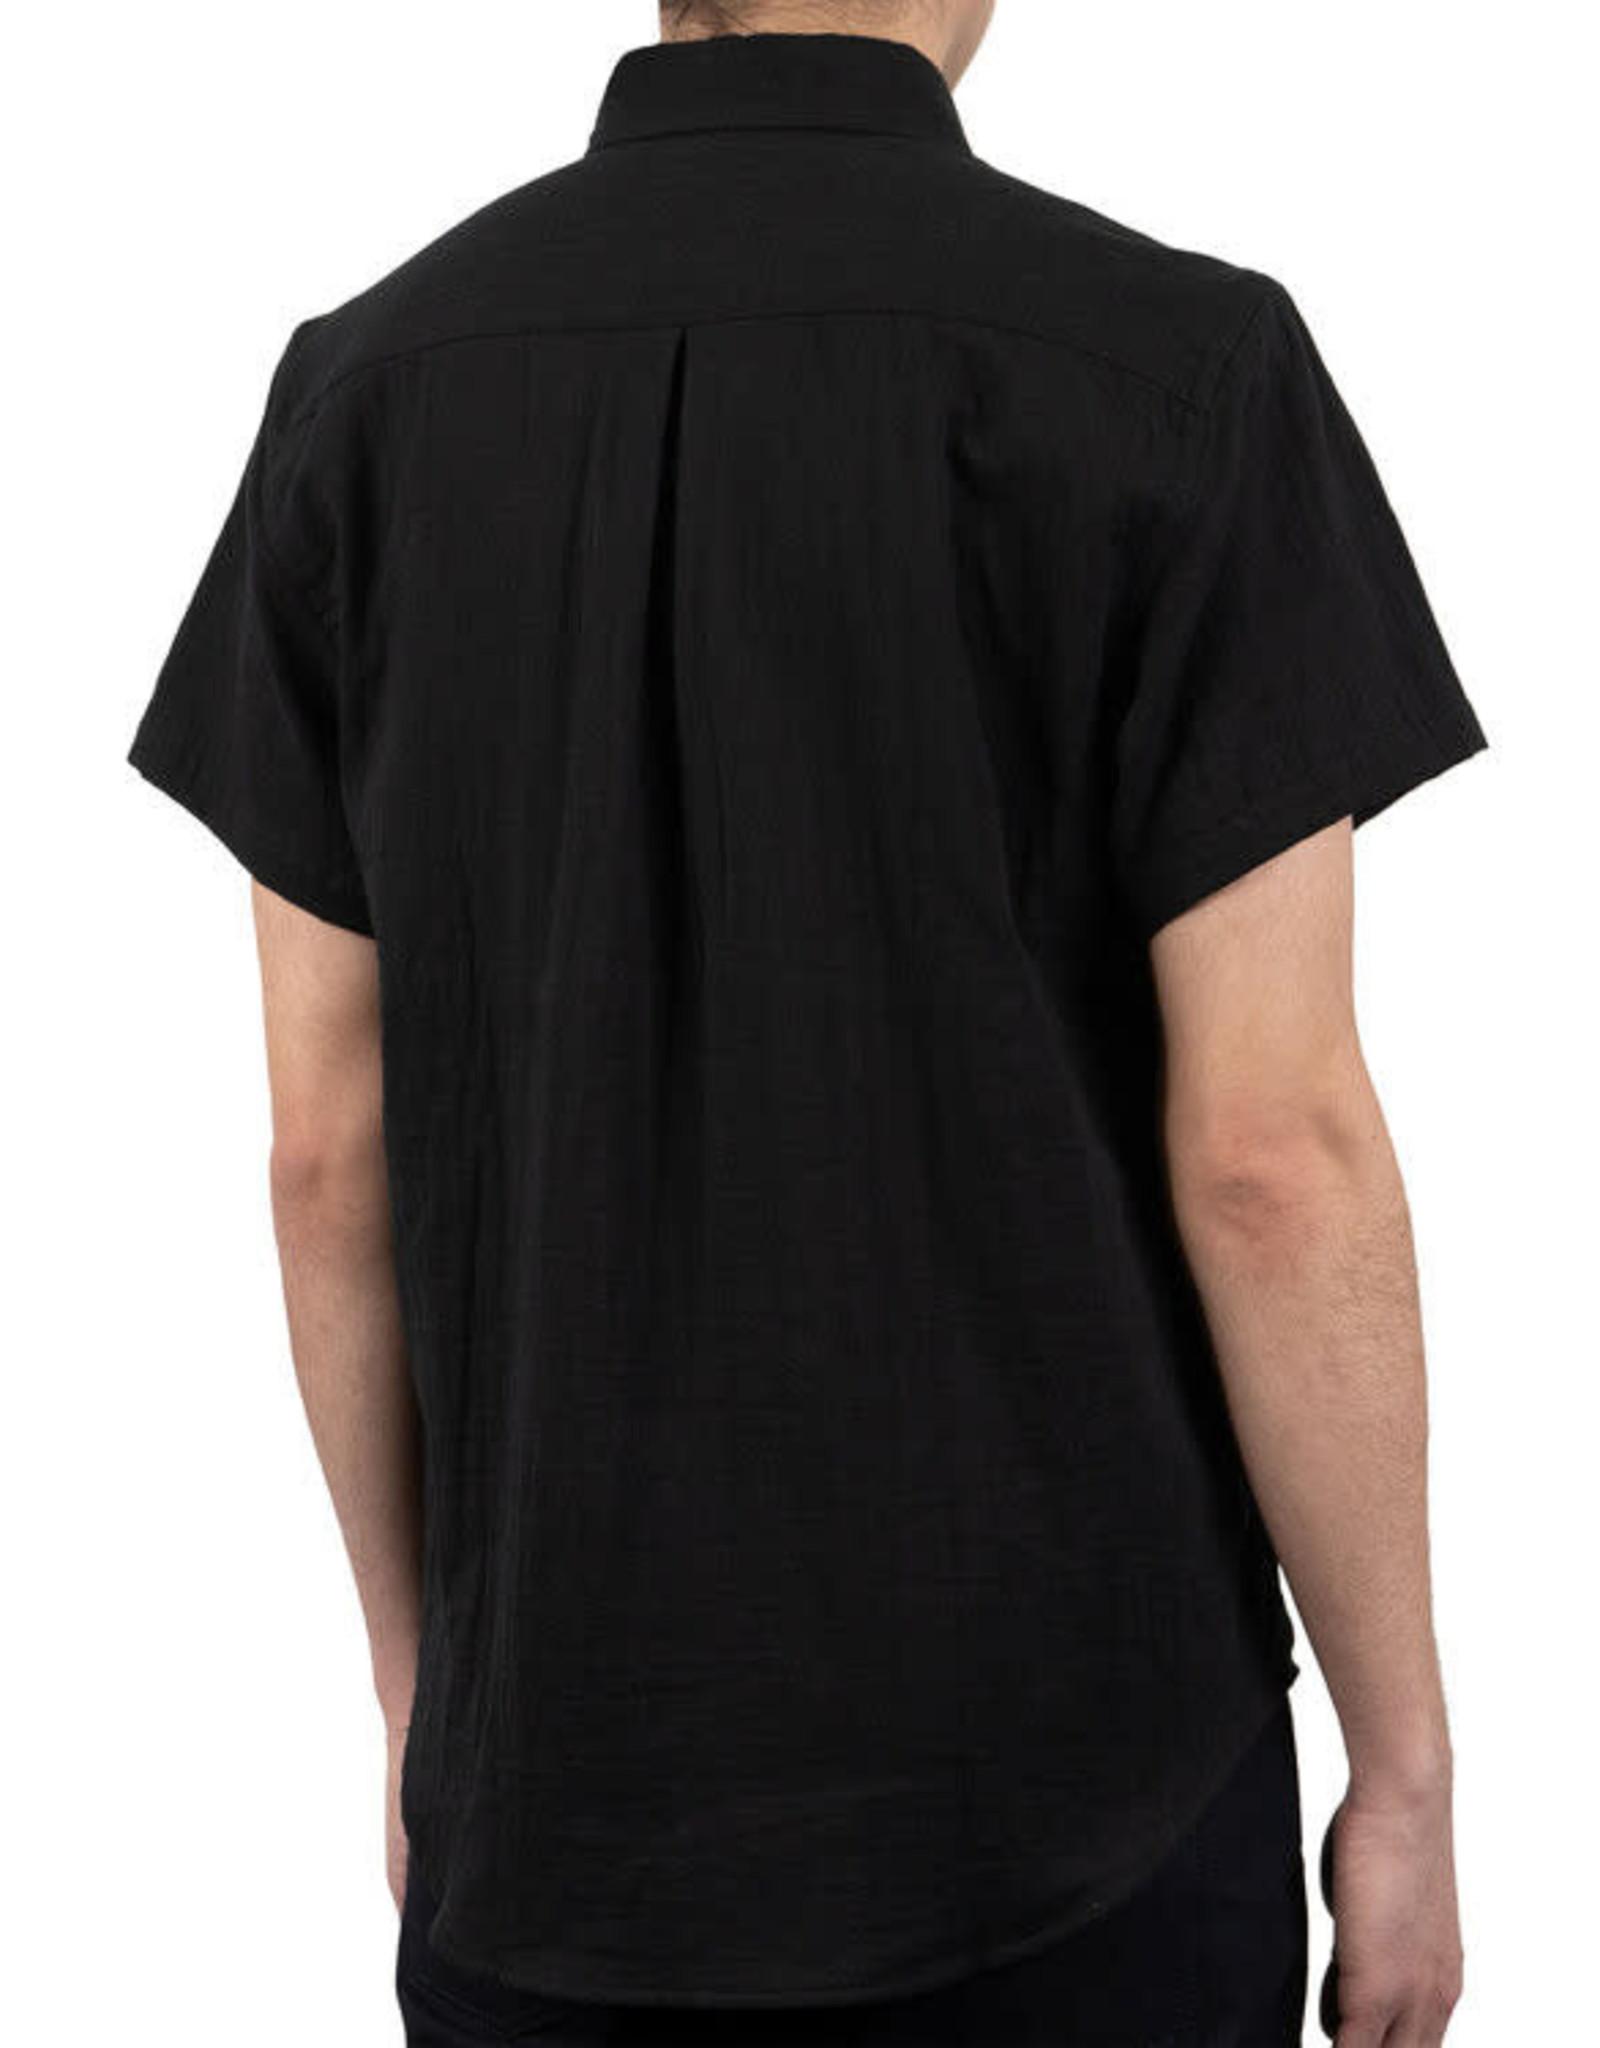 Naked and Famous Easy Shirt PE21 Naked & Famous Double Weave Gauze Black